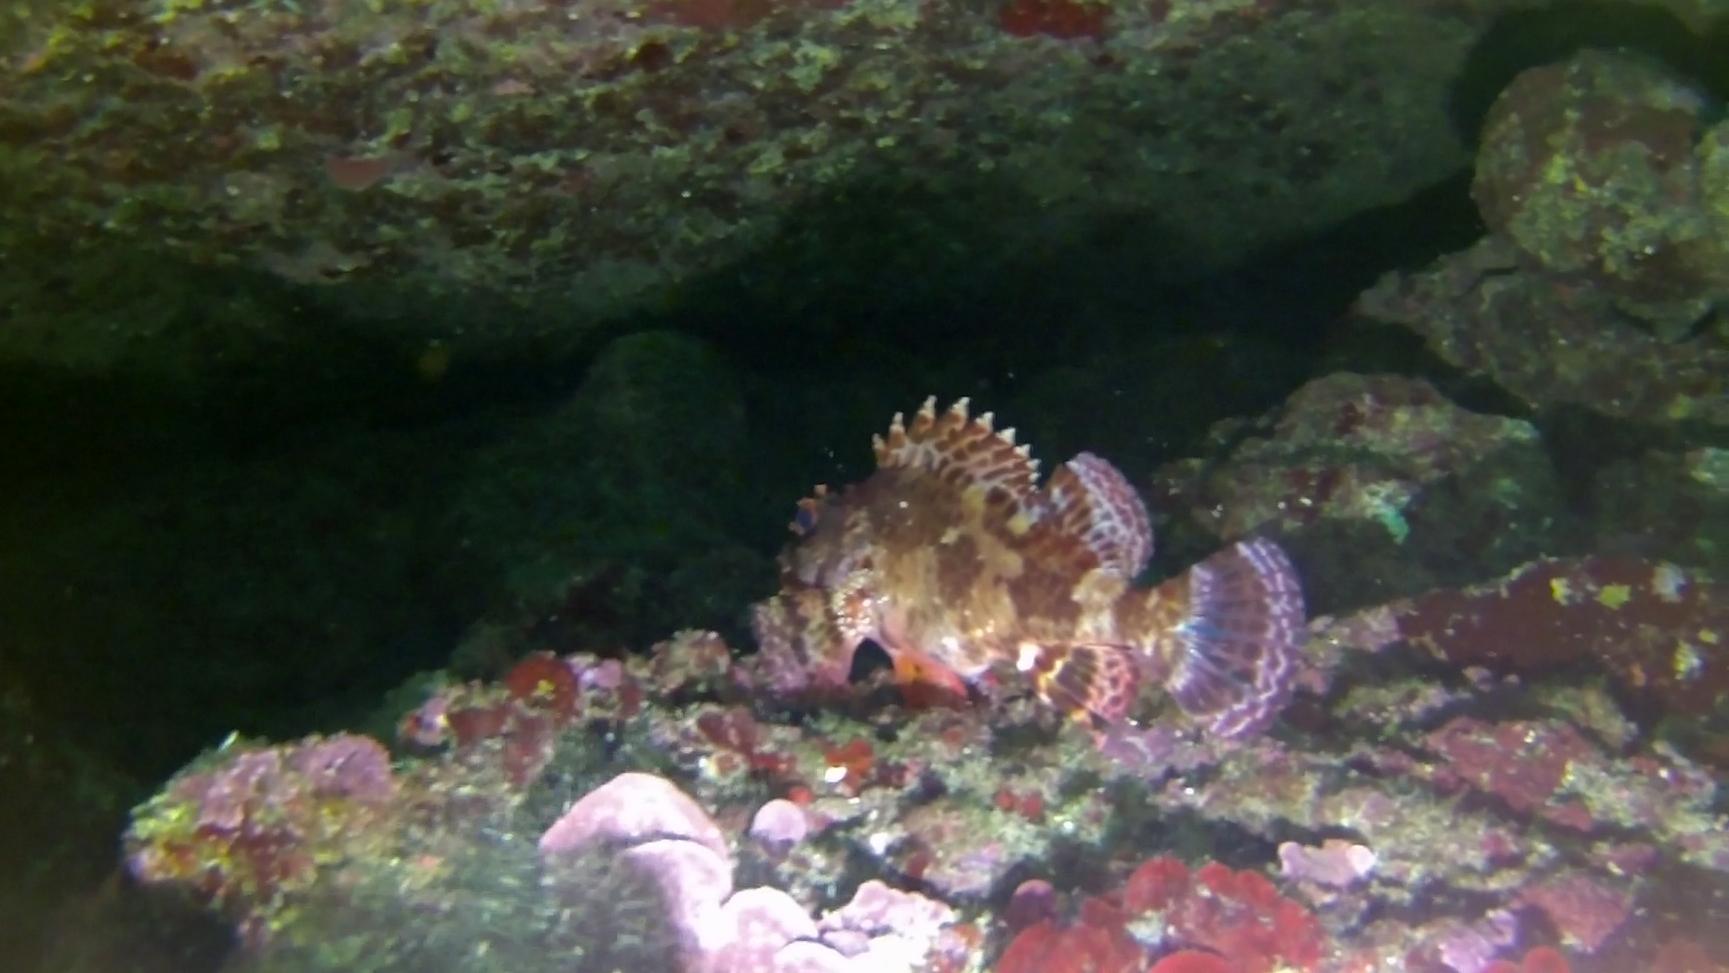 Scorfano nero o Scorfano bruno - Black Scorpionfish - Scorpaena porcus - intotheblue.it